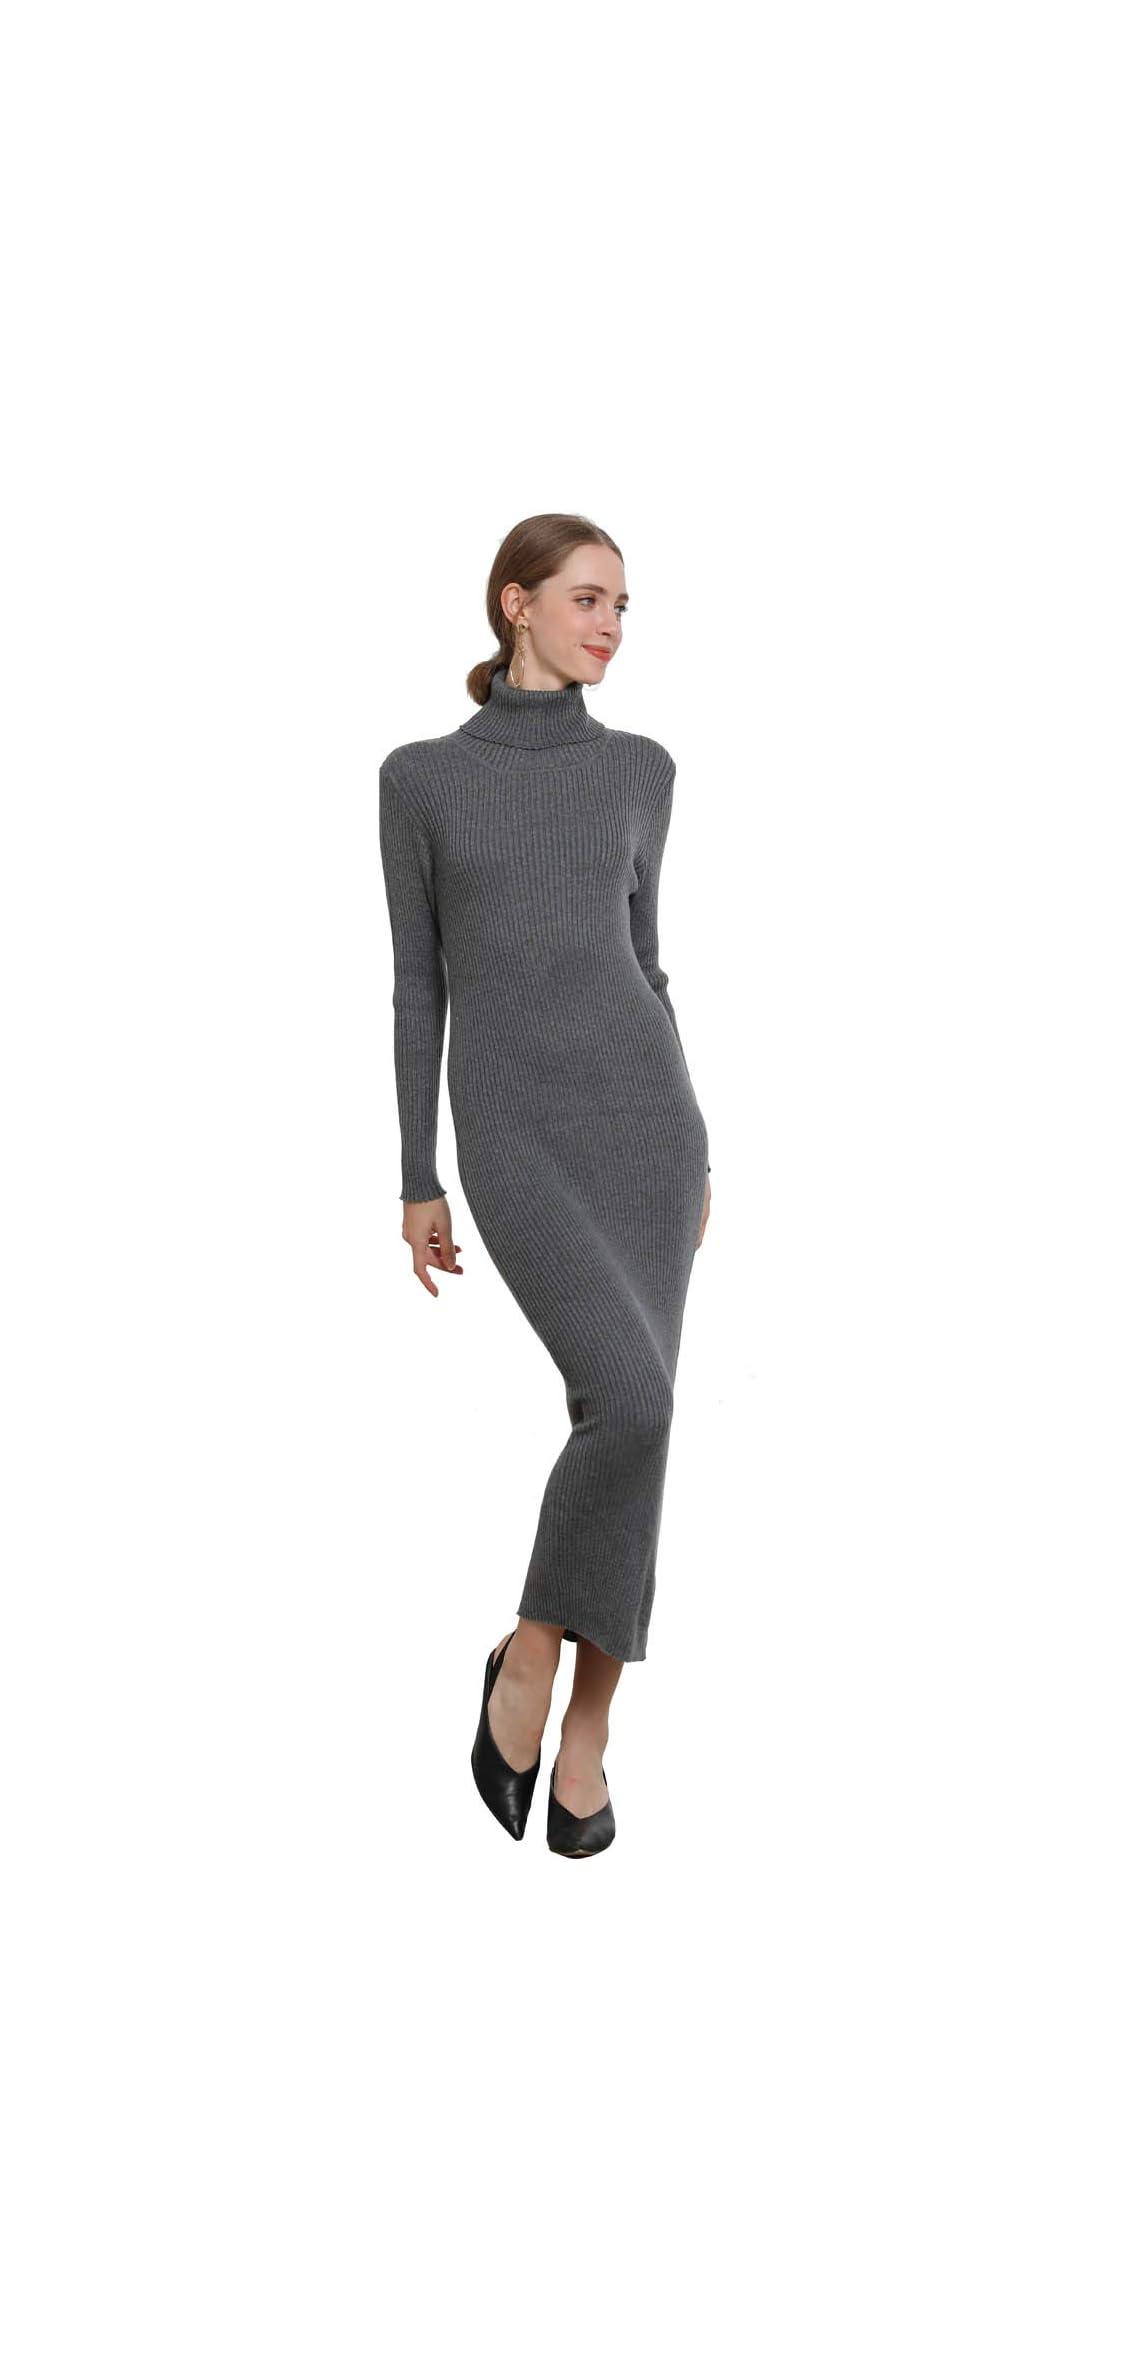 Women's Sweater Dress Cashmere Wool Ribbed Knit Turtleneck Long